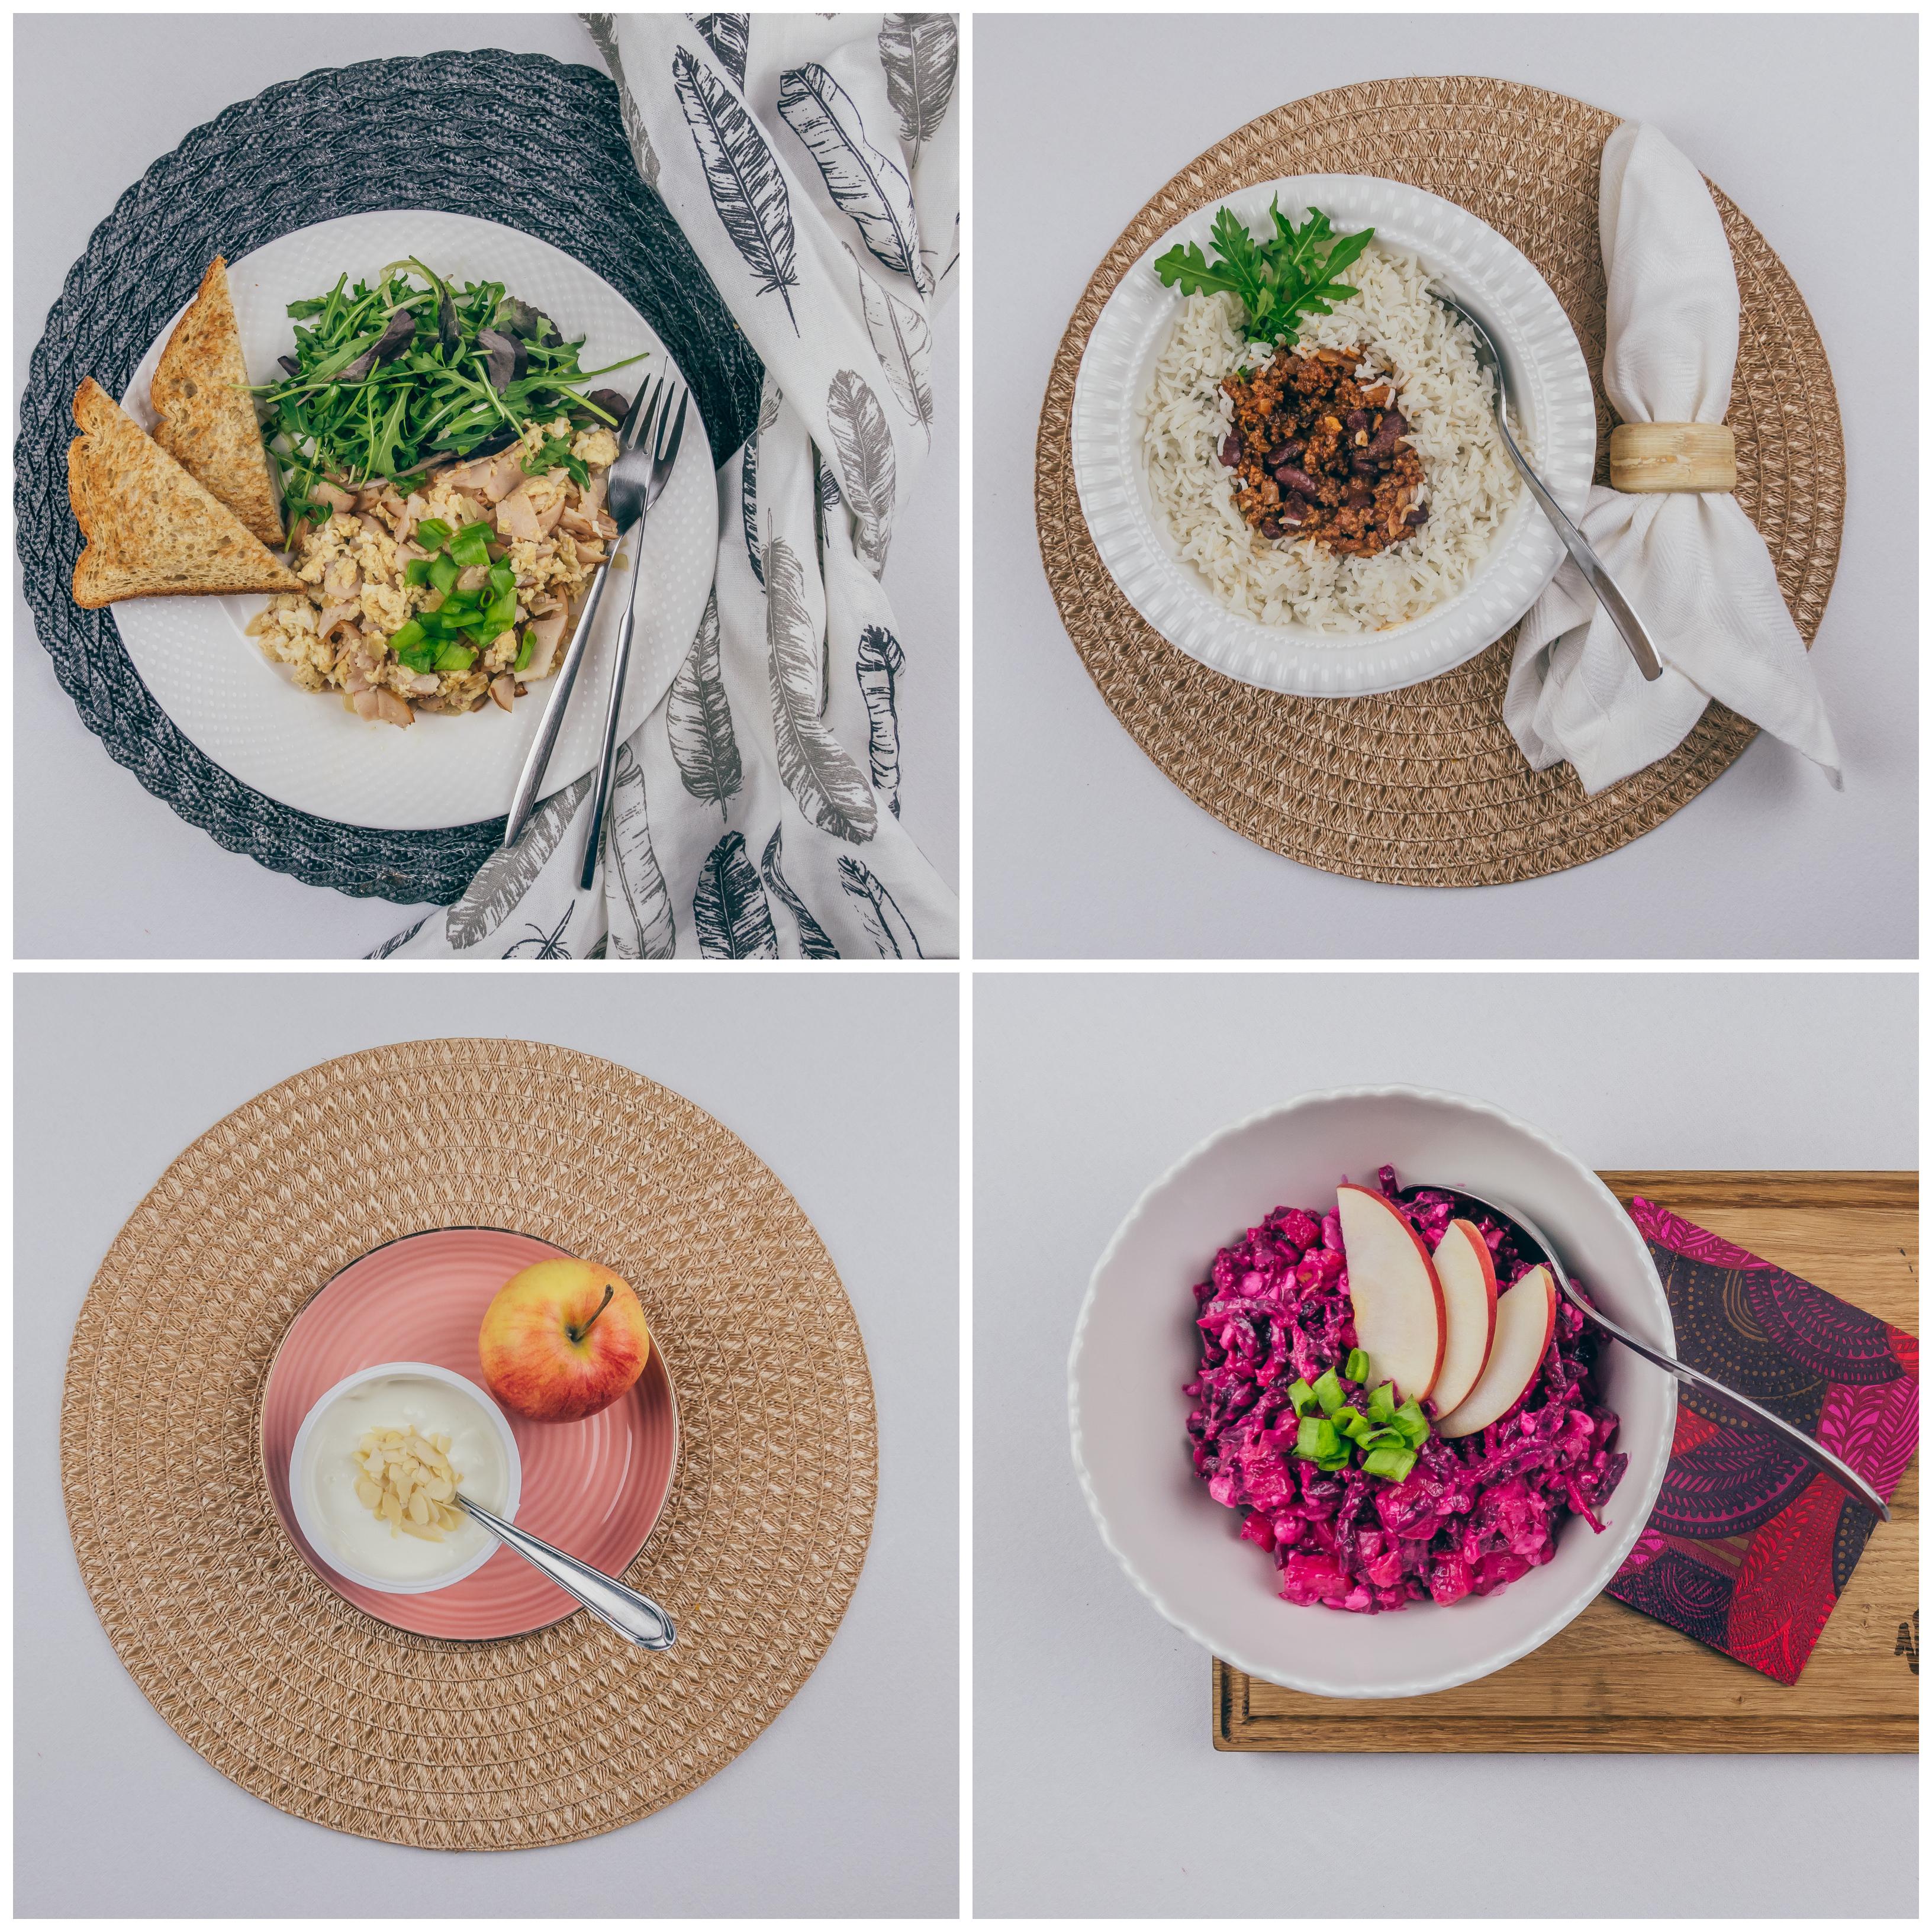 Menüü 16 – 1900 kalorit päevas